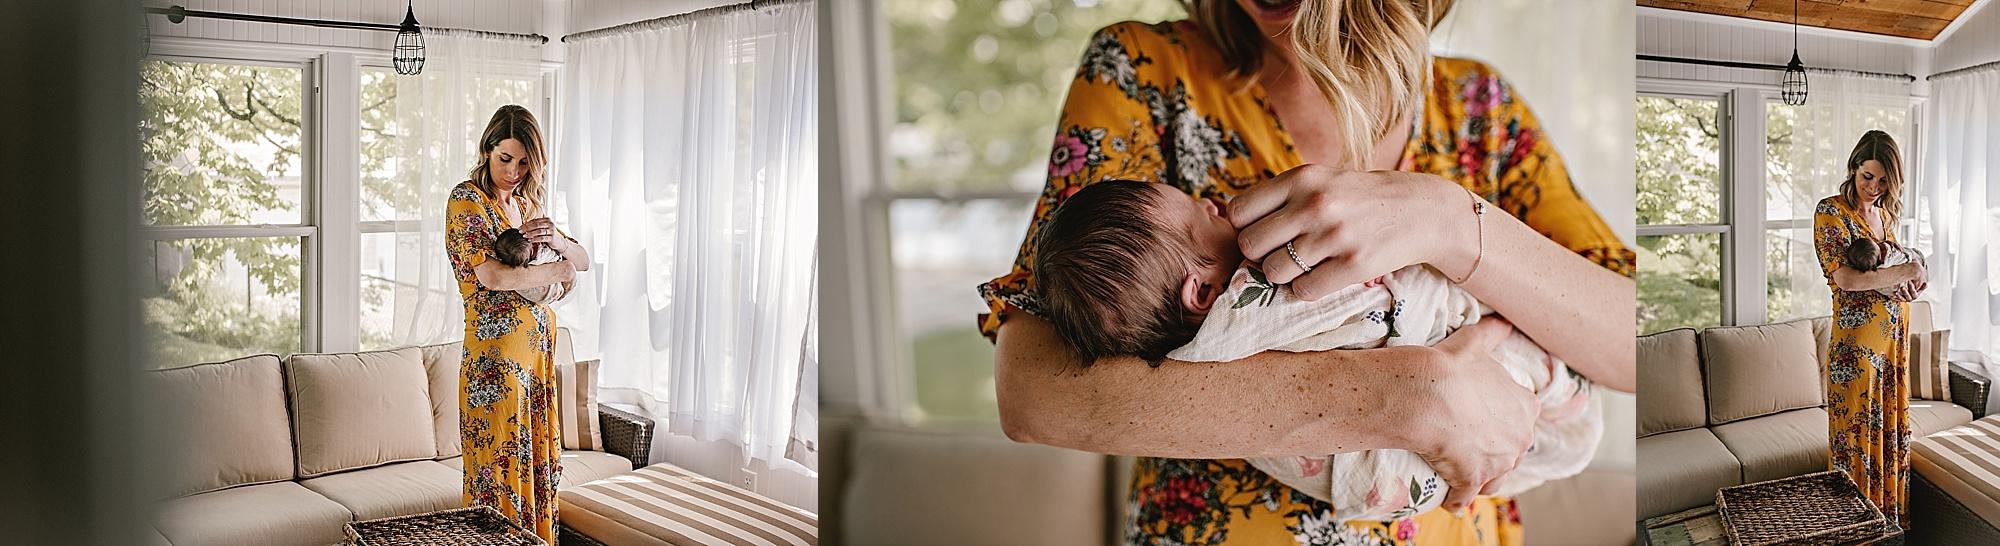 lauren-grayson-photography-cleveland-ohio-photographer-newborn-session-in-home-lifestyle-newborn-family-vivian_0646.jpg